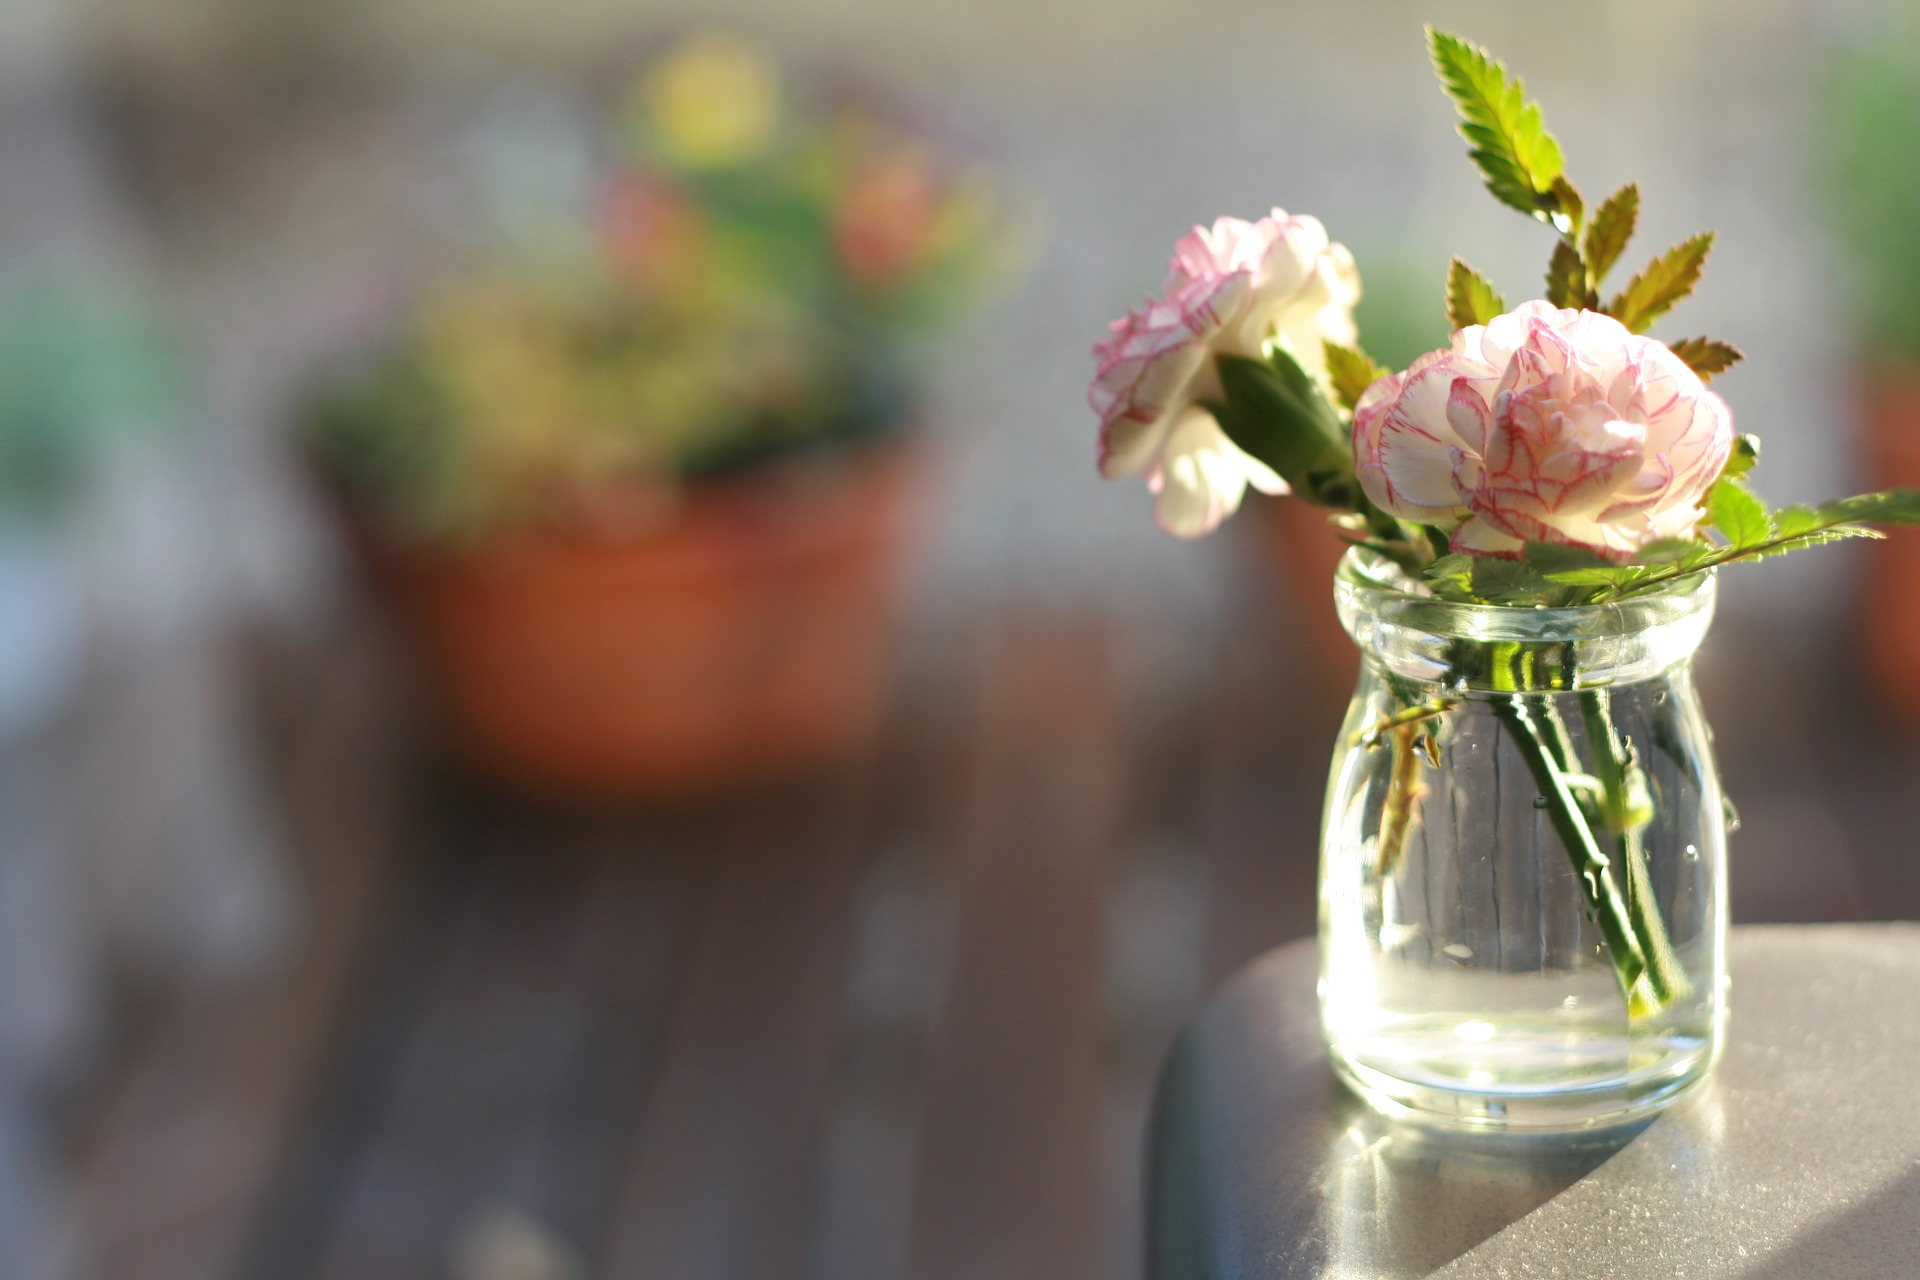 flowers-802998_1920